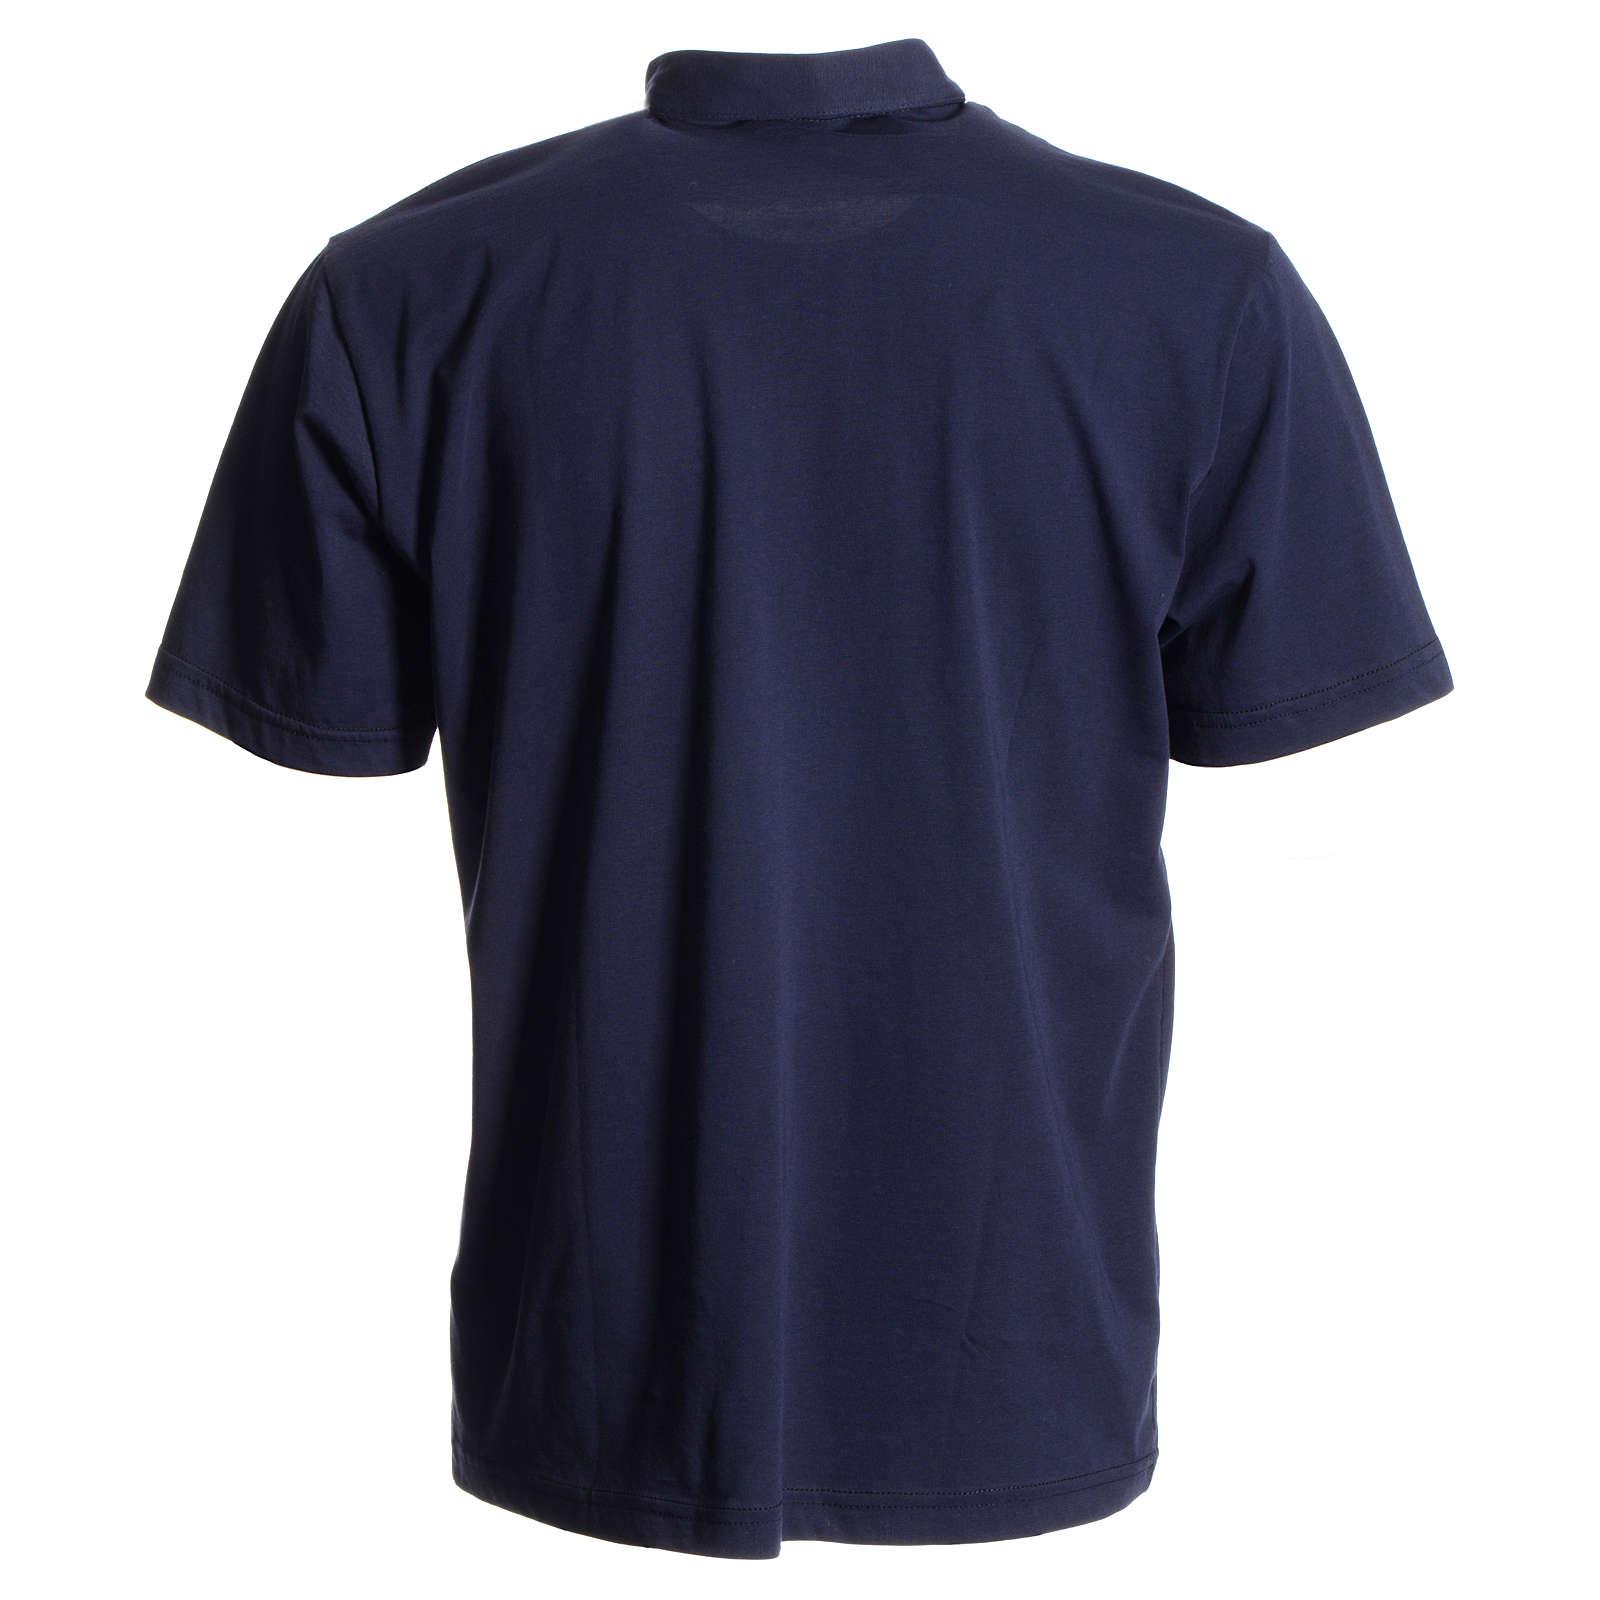 Priesterpolo, dunkelblau, 100% Baumwolle 4